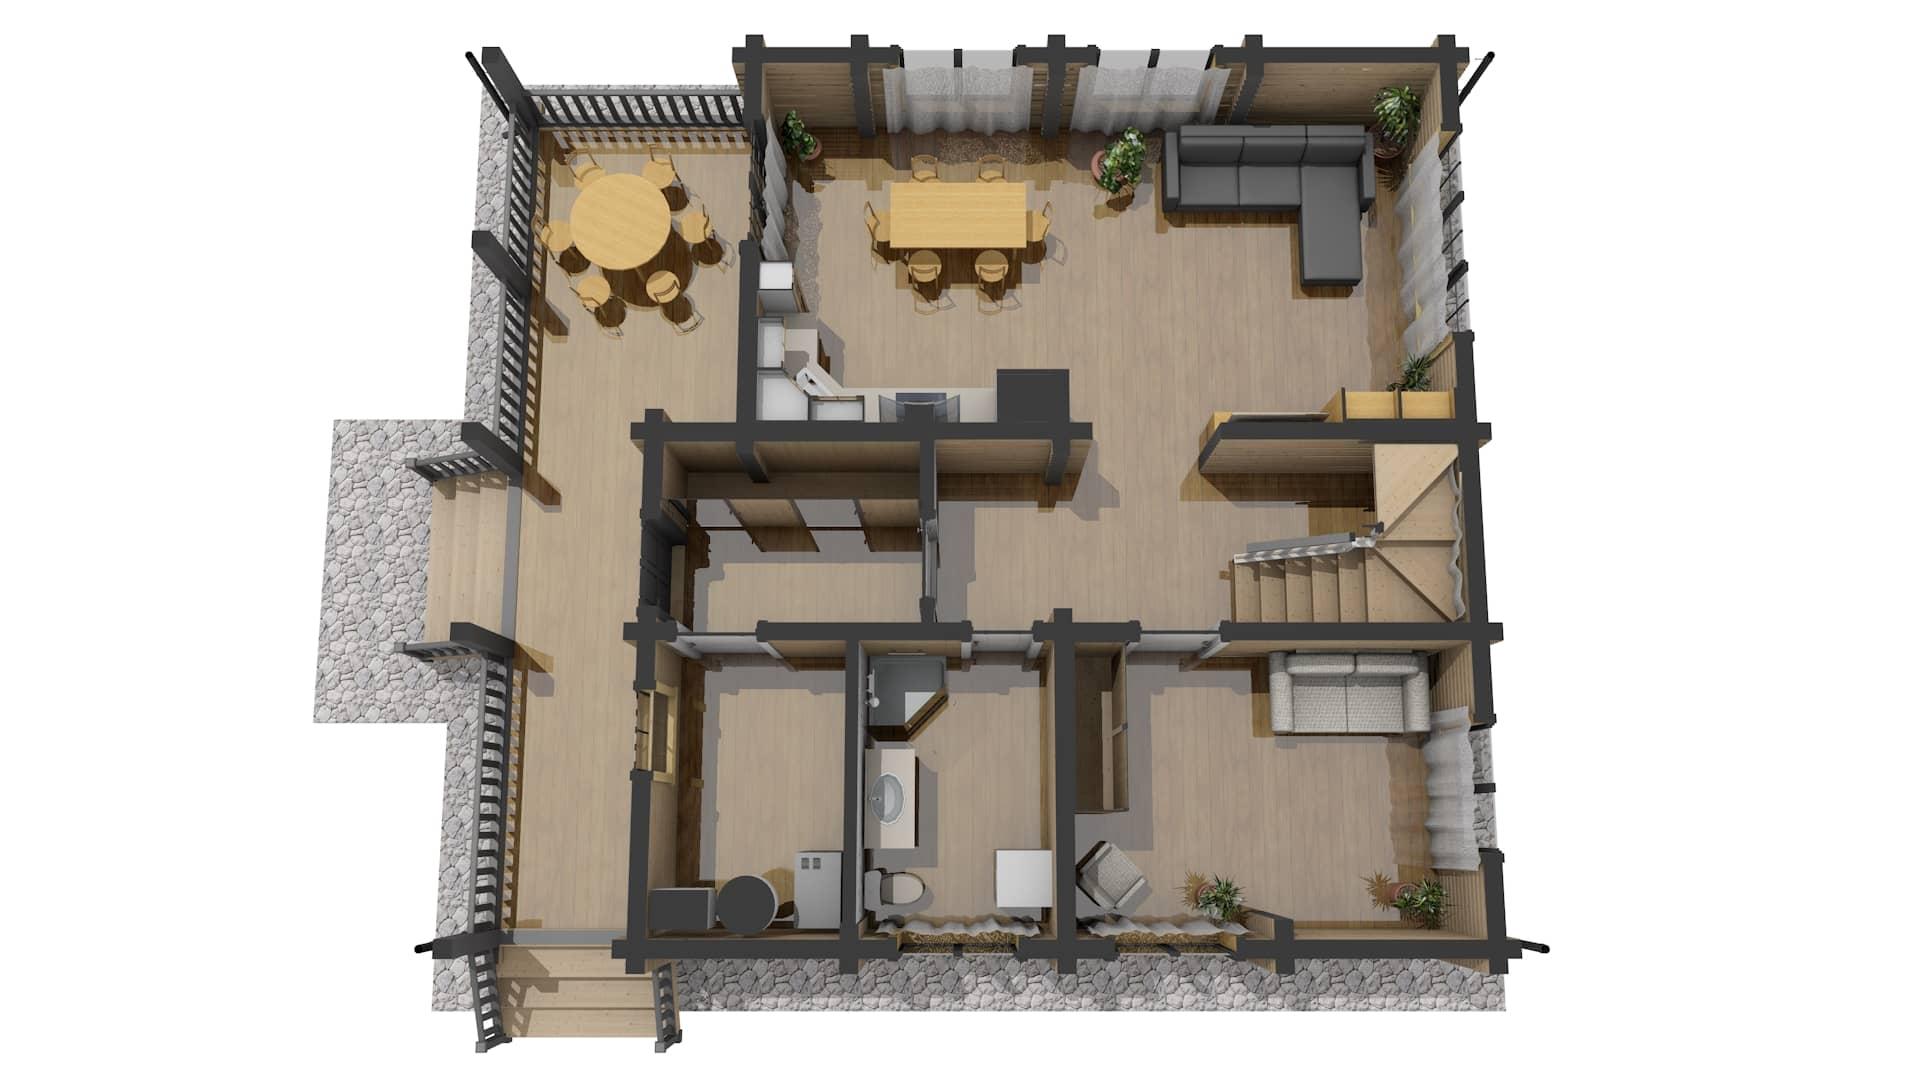 Проект дома из бруса Малиновка - План 1 этажа 3D